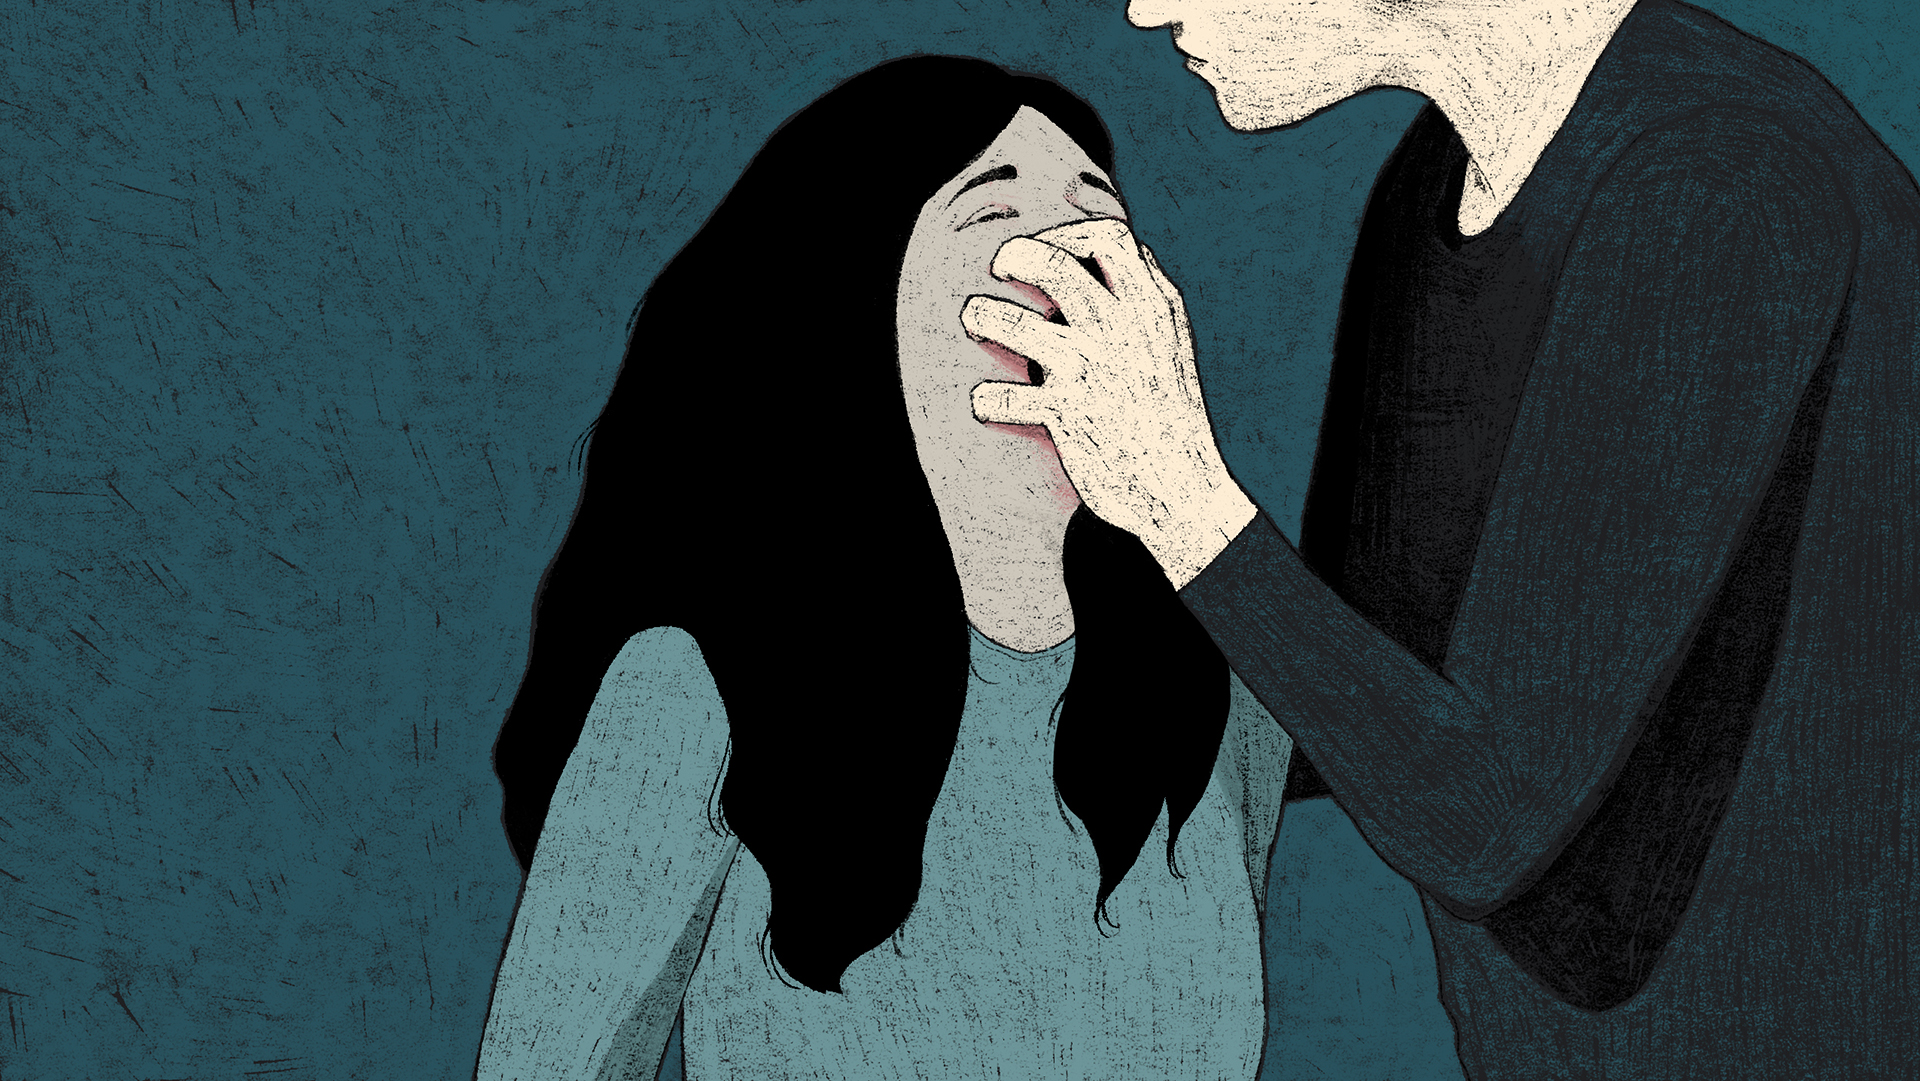 rebecca-hendin-bbc-newsbeat-domestic-abuse-animation-2